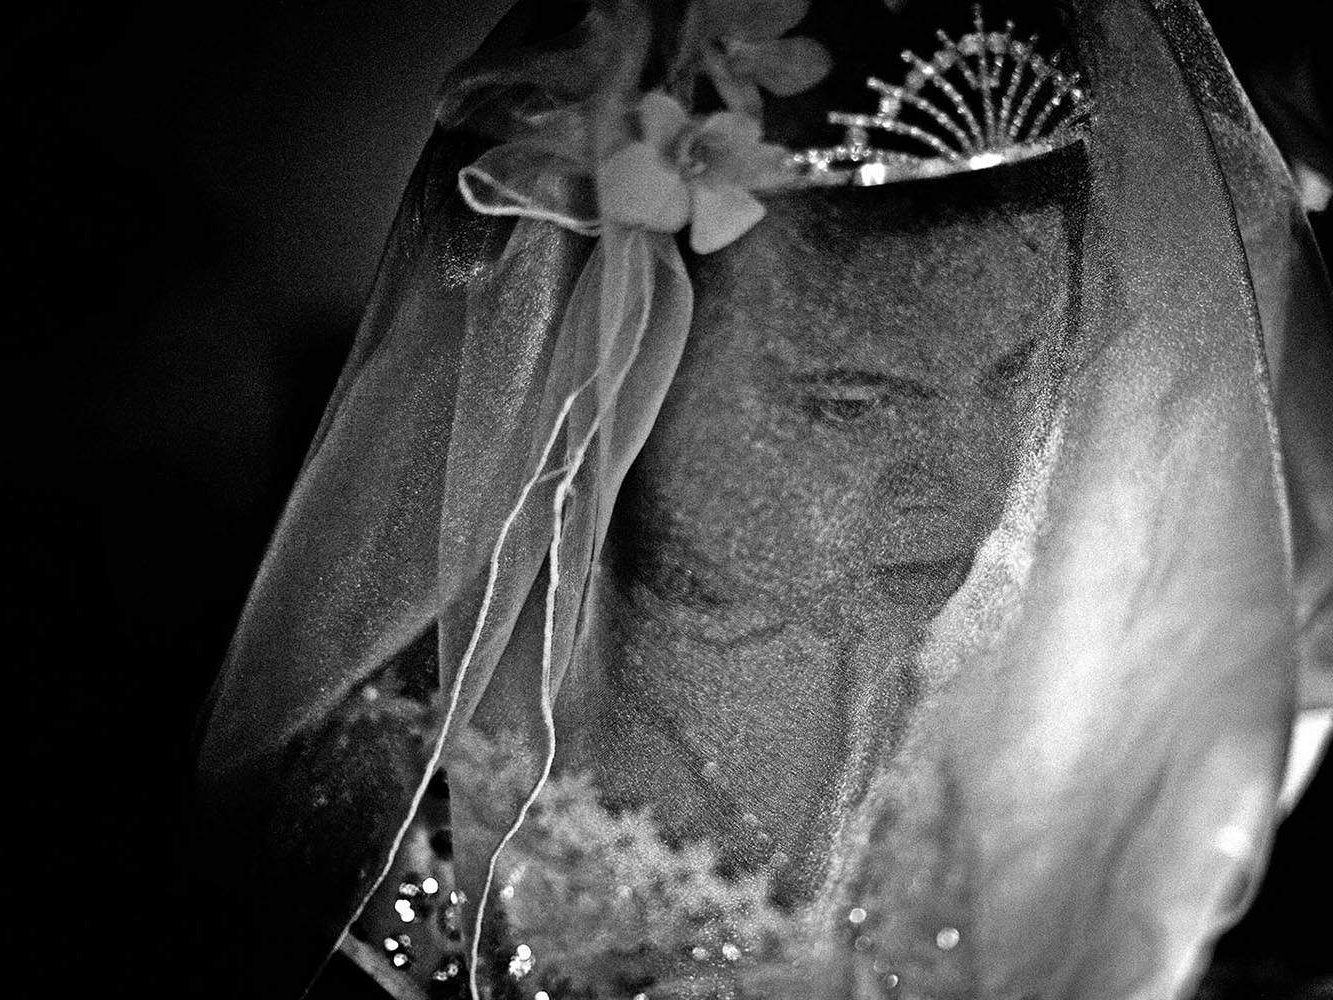 vietnam photographer smallthings binhdang 10